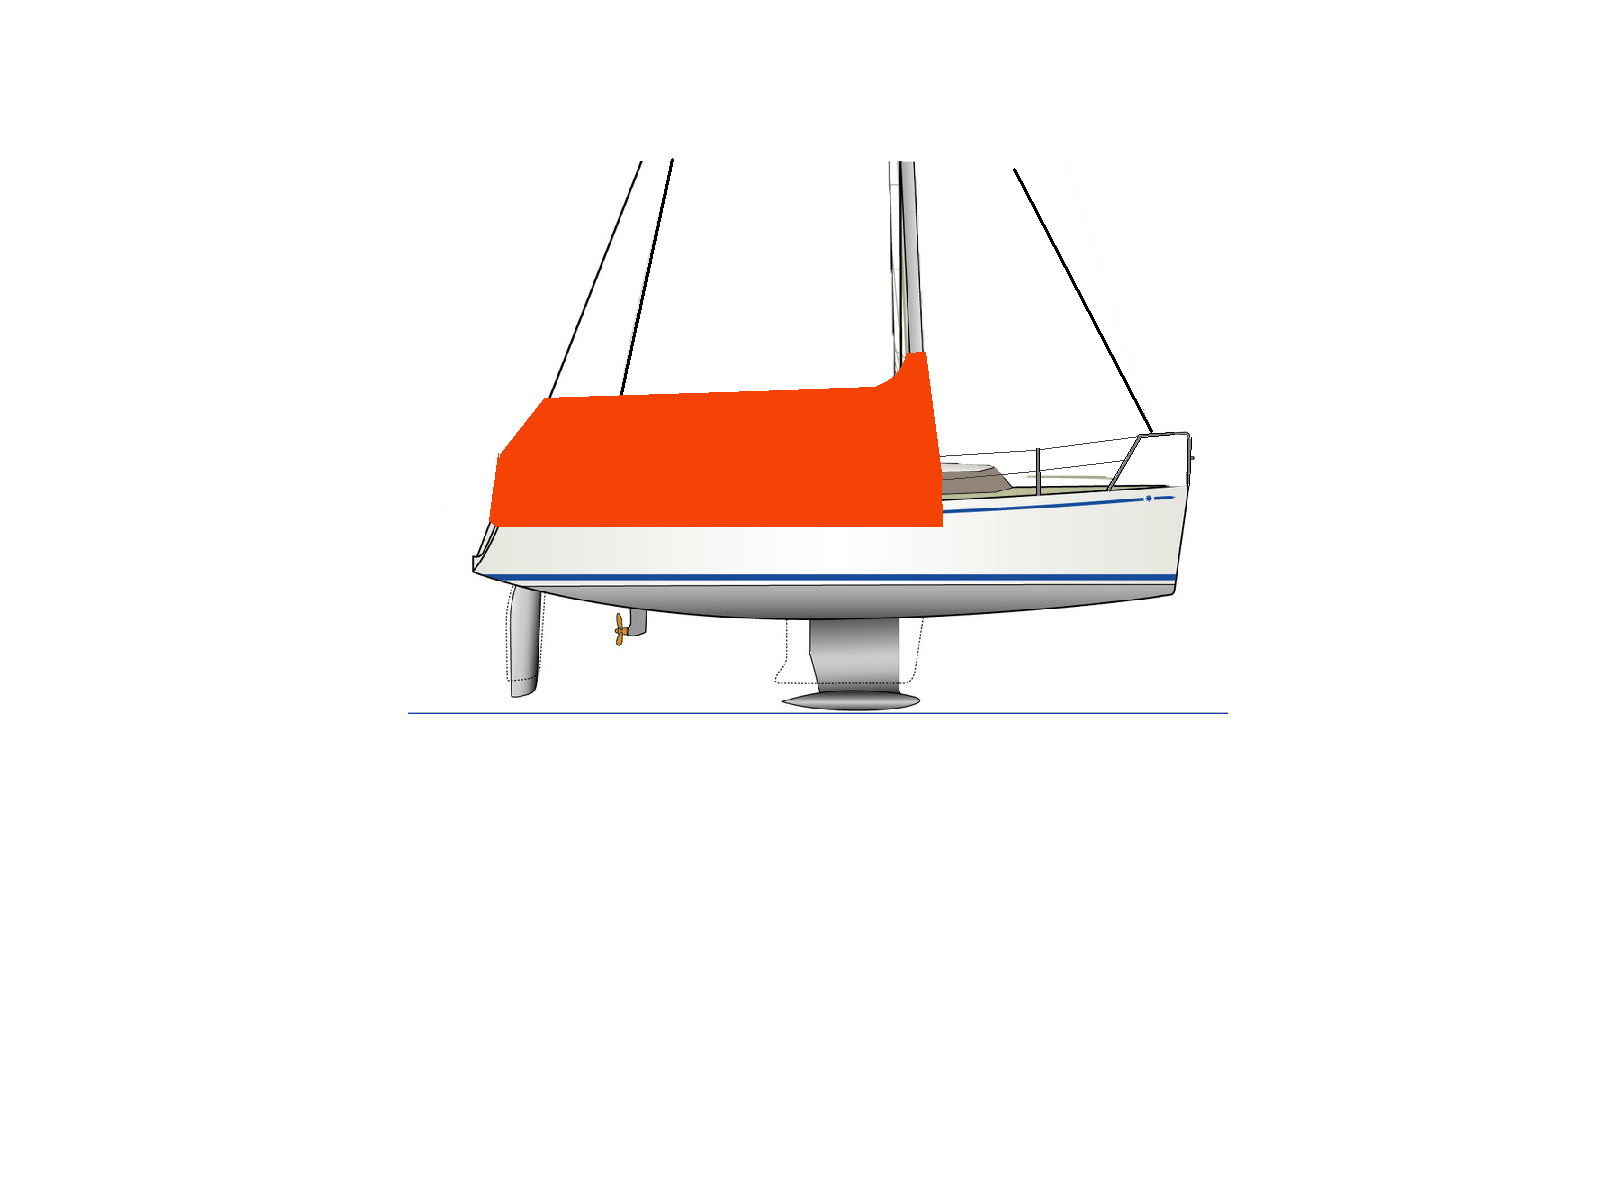 02 02 02  Typ F Segelboot Plichtpersenning langer Rand.PNG